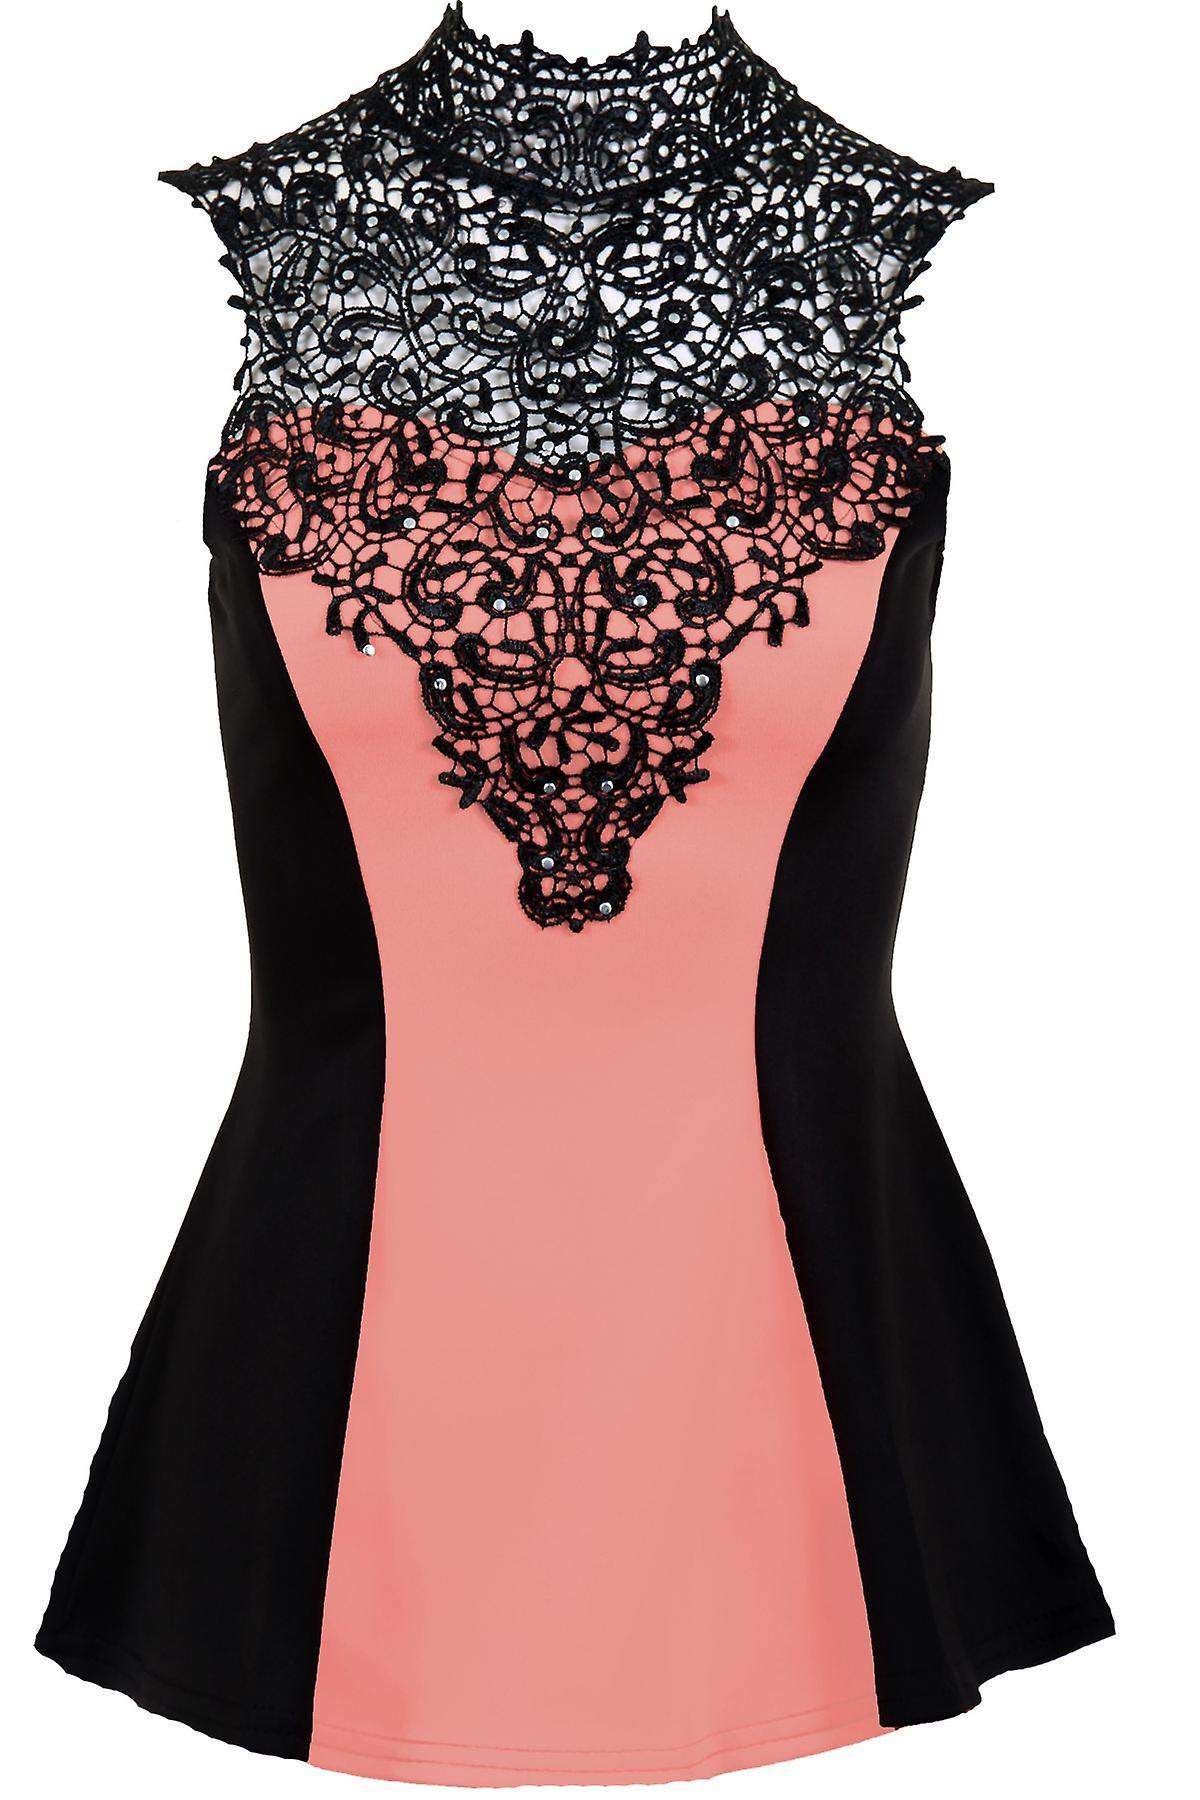 Ladies Sleeveless Crochet Studded Neck Contrast Tie Back Women's Flare Top